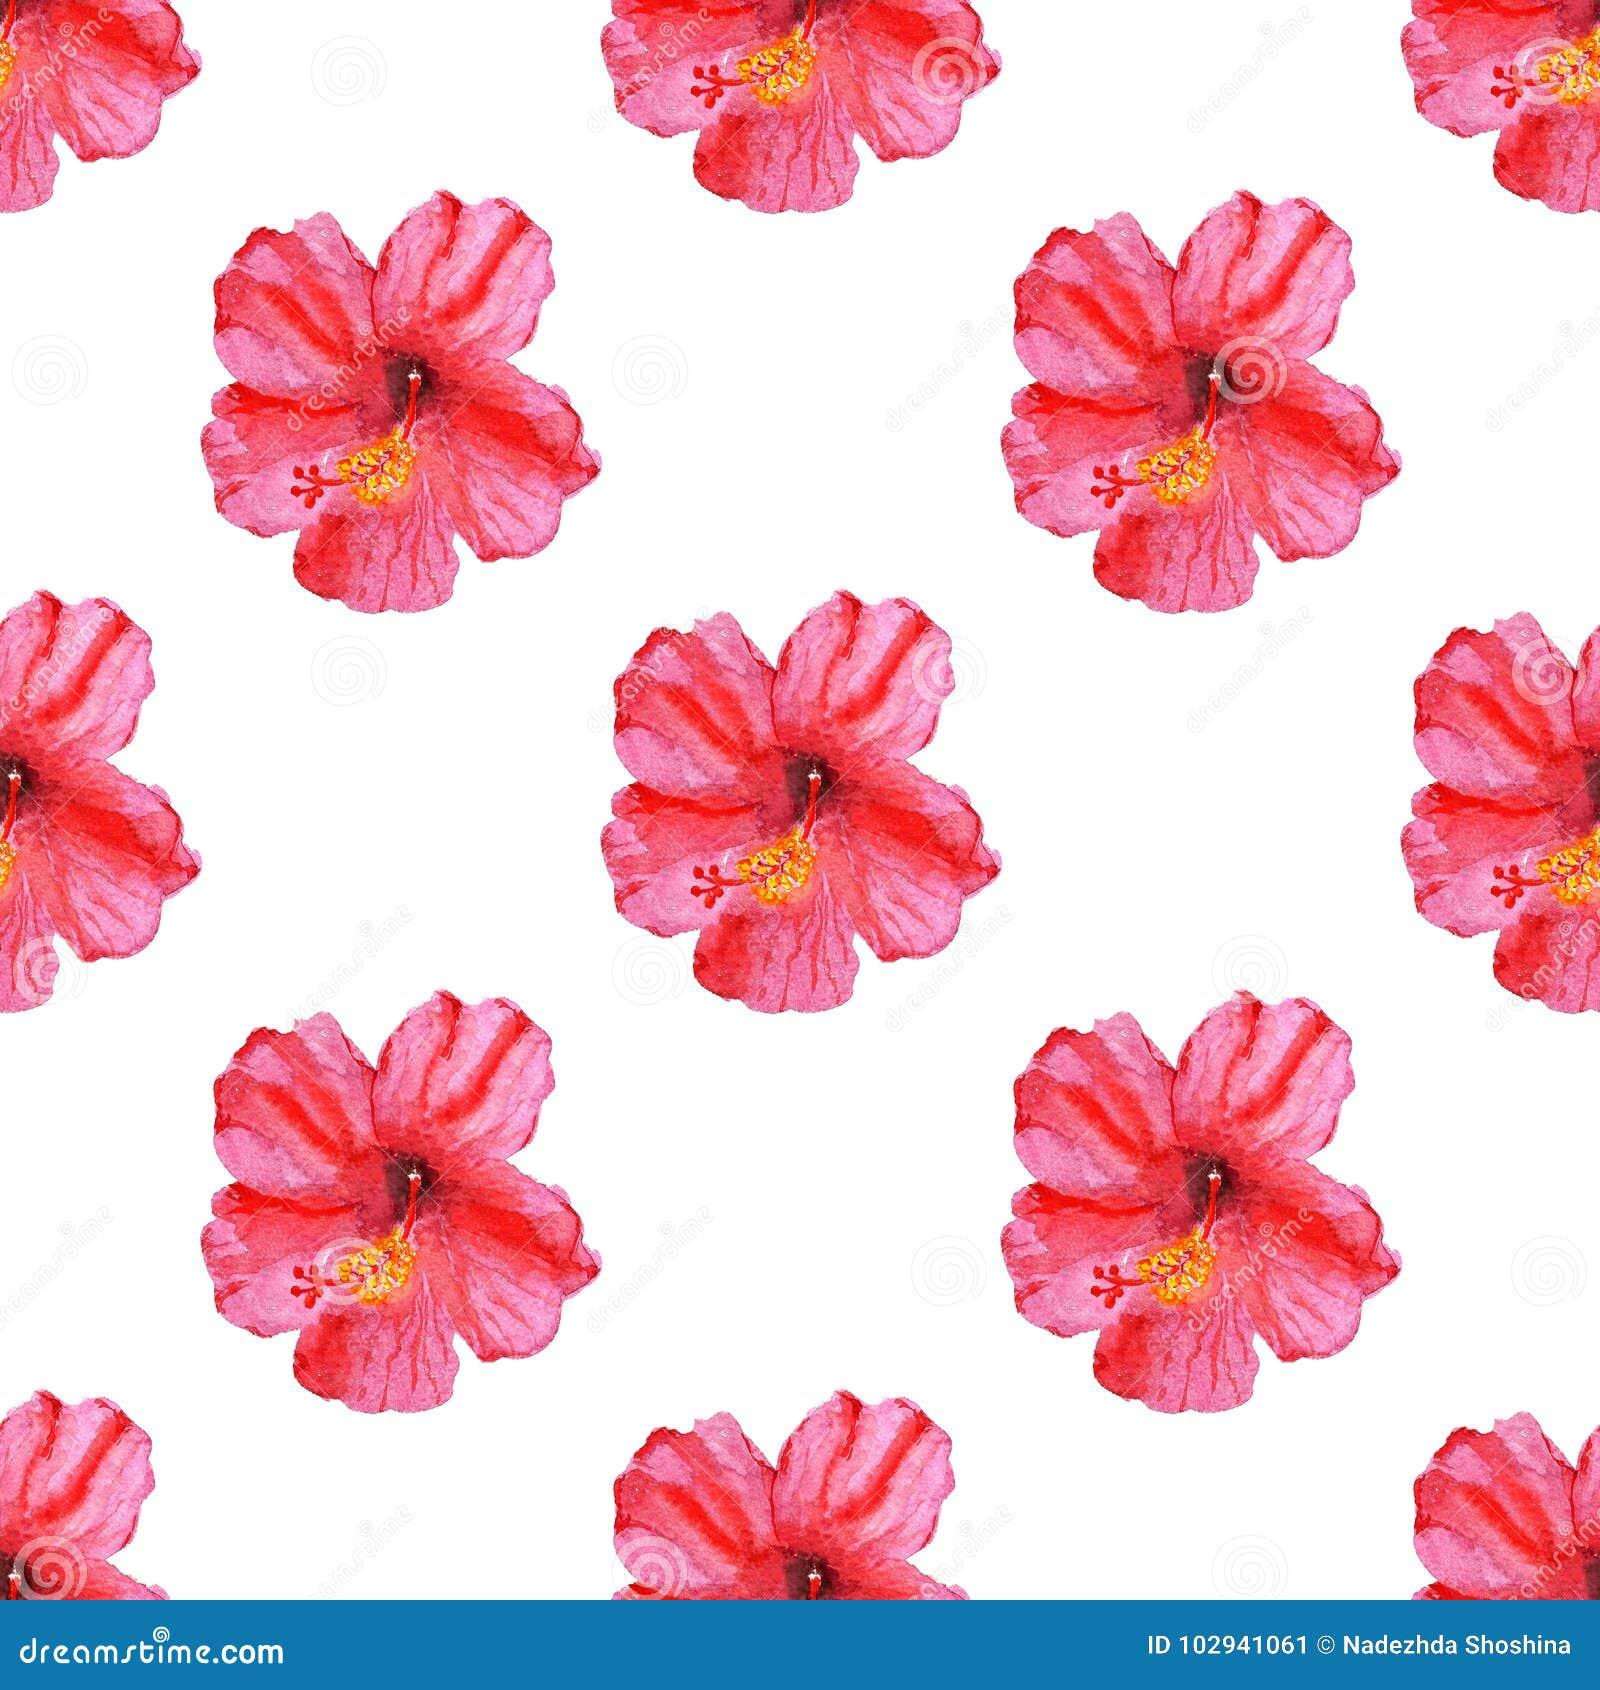 Seamless pattern with hibiscus flower stock illustration download seamless pattern with hibiscus flower stock illustration illustration of background paint 102941061 izmirmasajfo